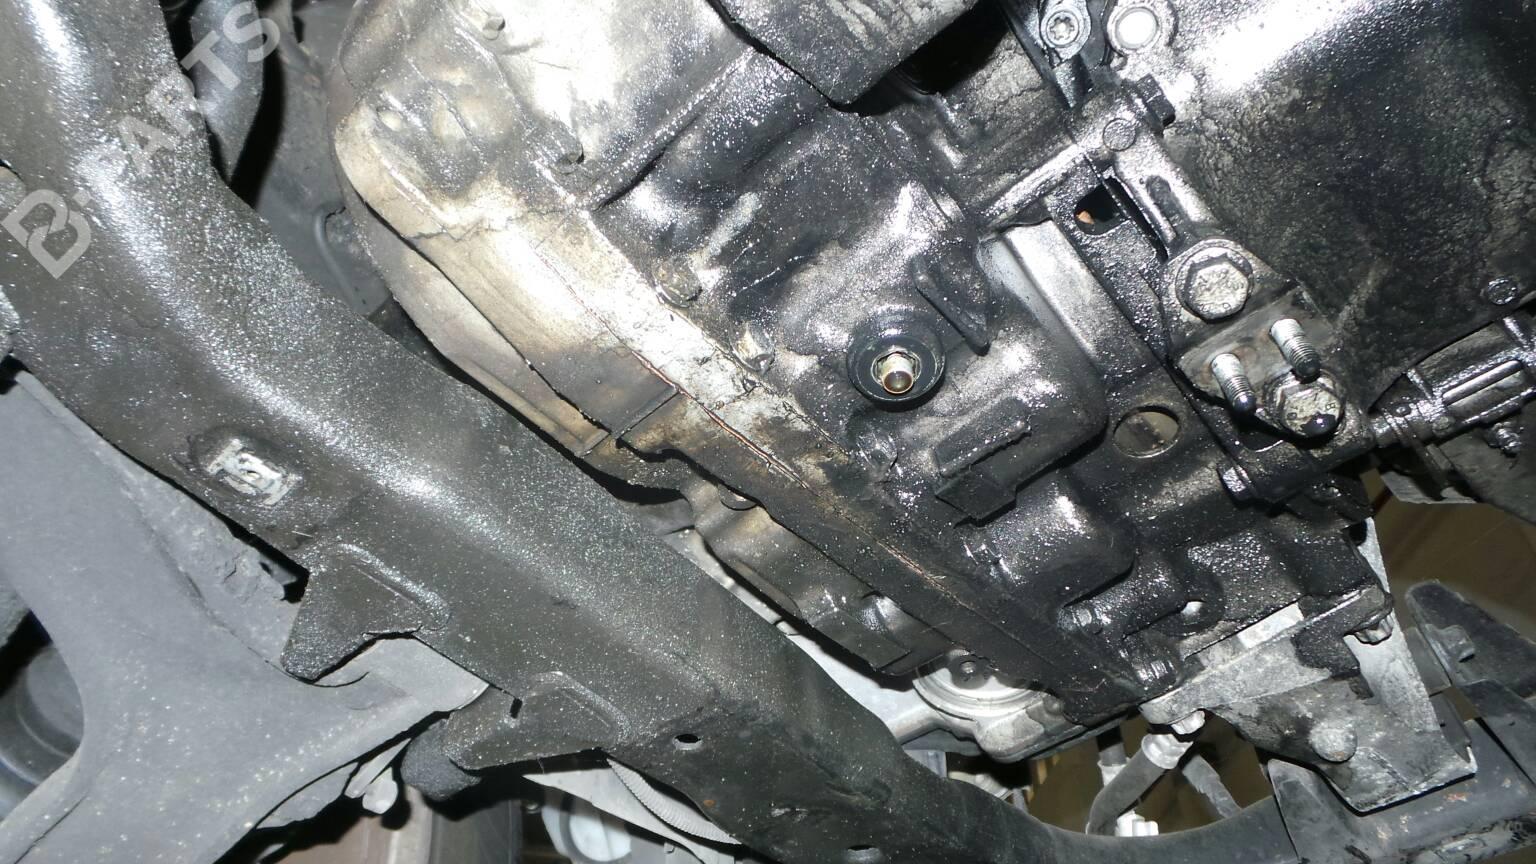 to sale hatchback salvage dynamic breakers jtd for engine car scrap silverlake multijet autoparts auction door details fiat panda